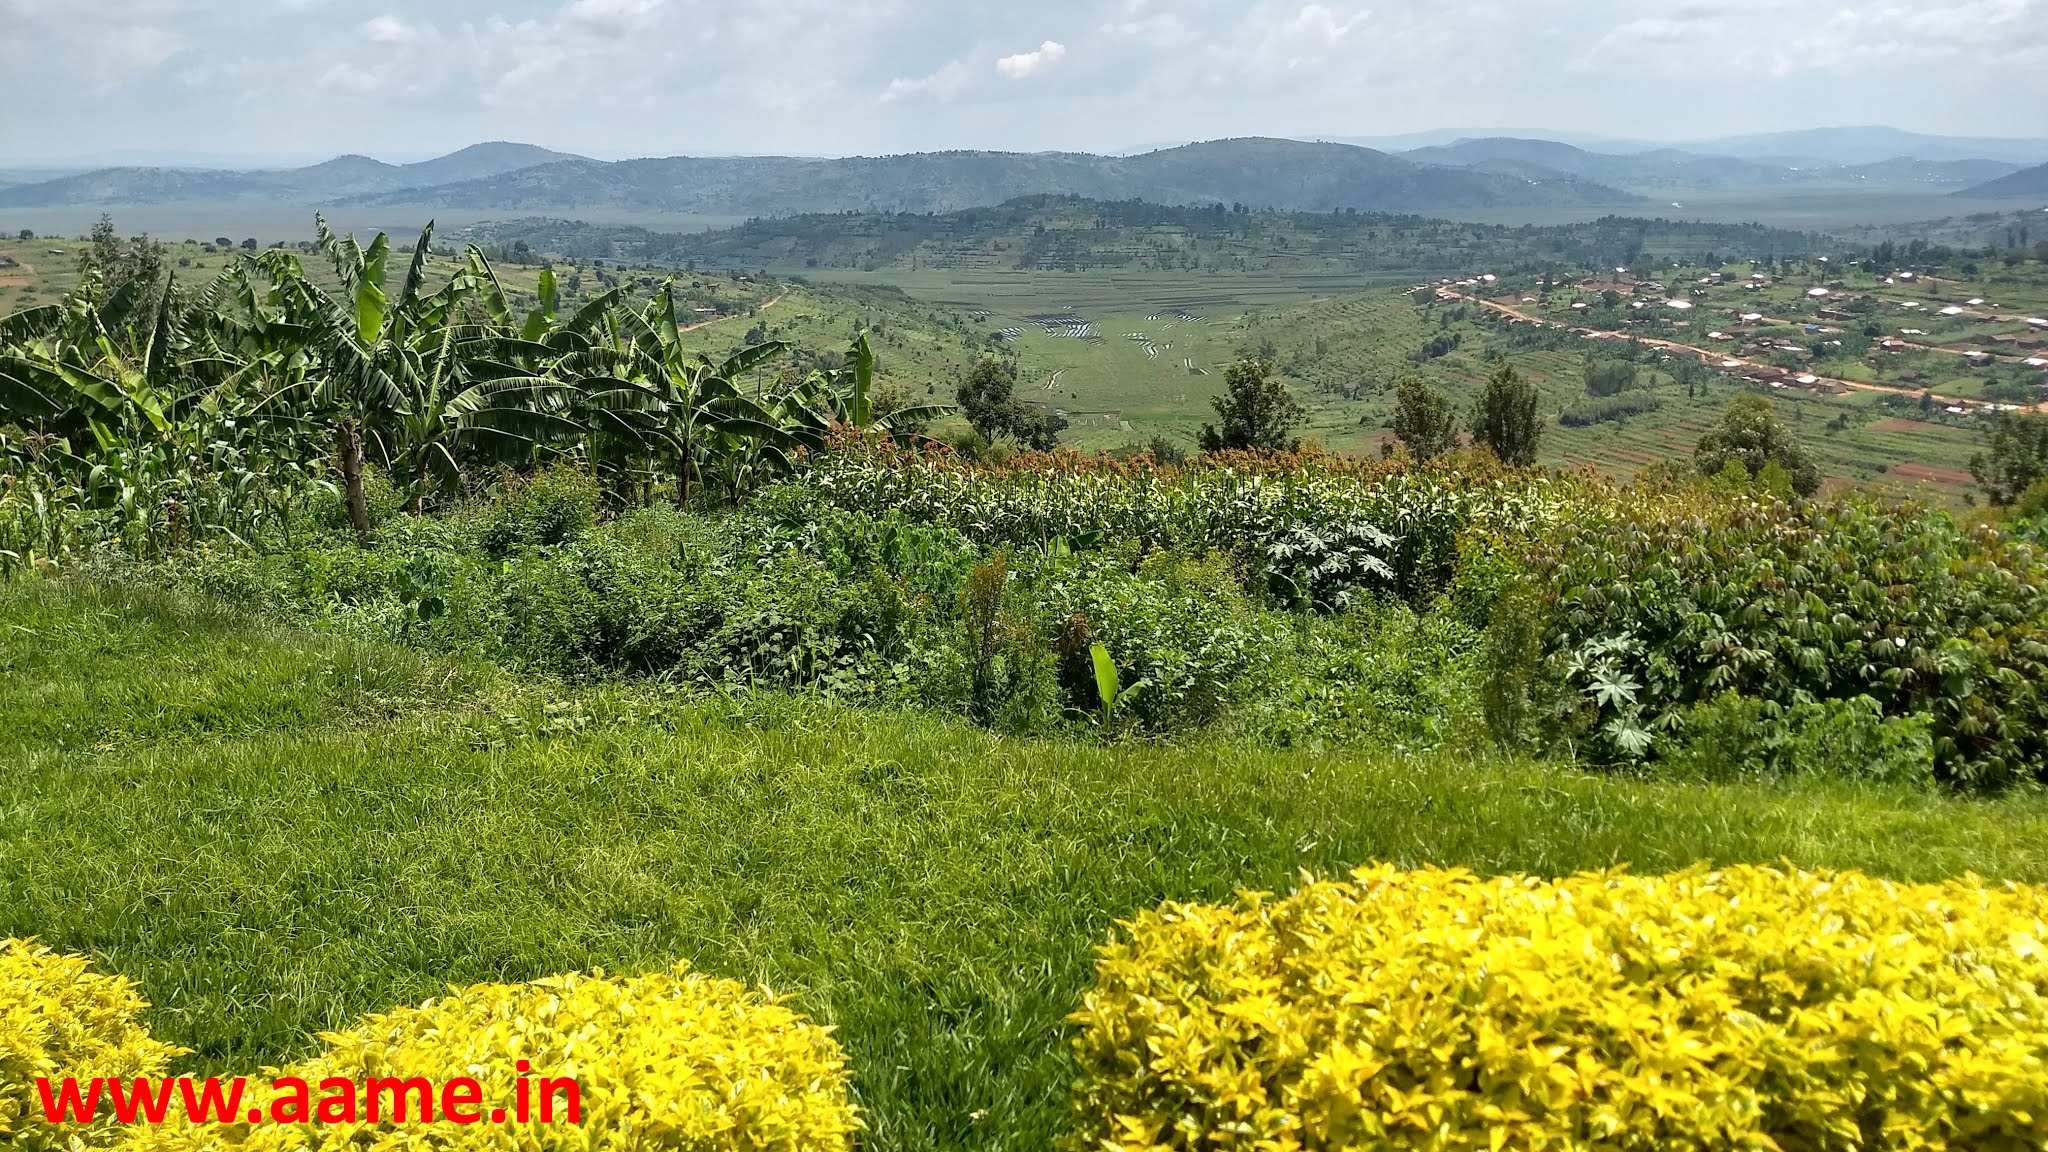 Rwanda - Landscape - 05